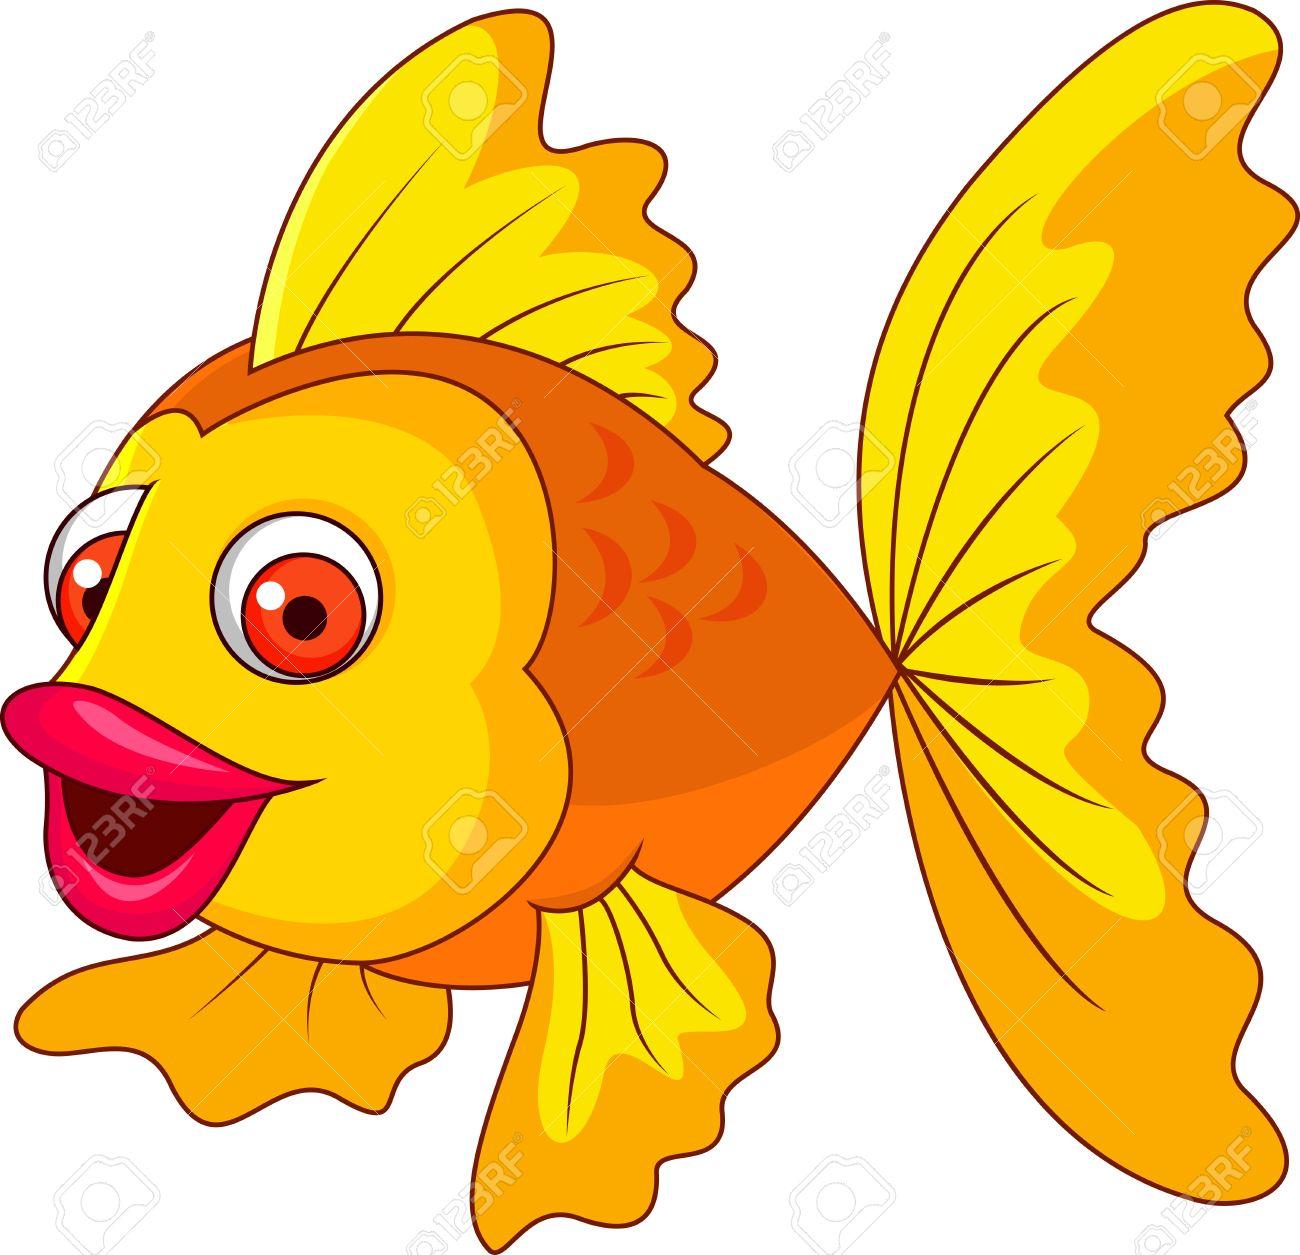 Cute golden fish cartoon Stock Photo - 19287932